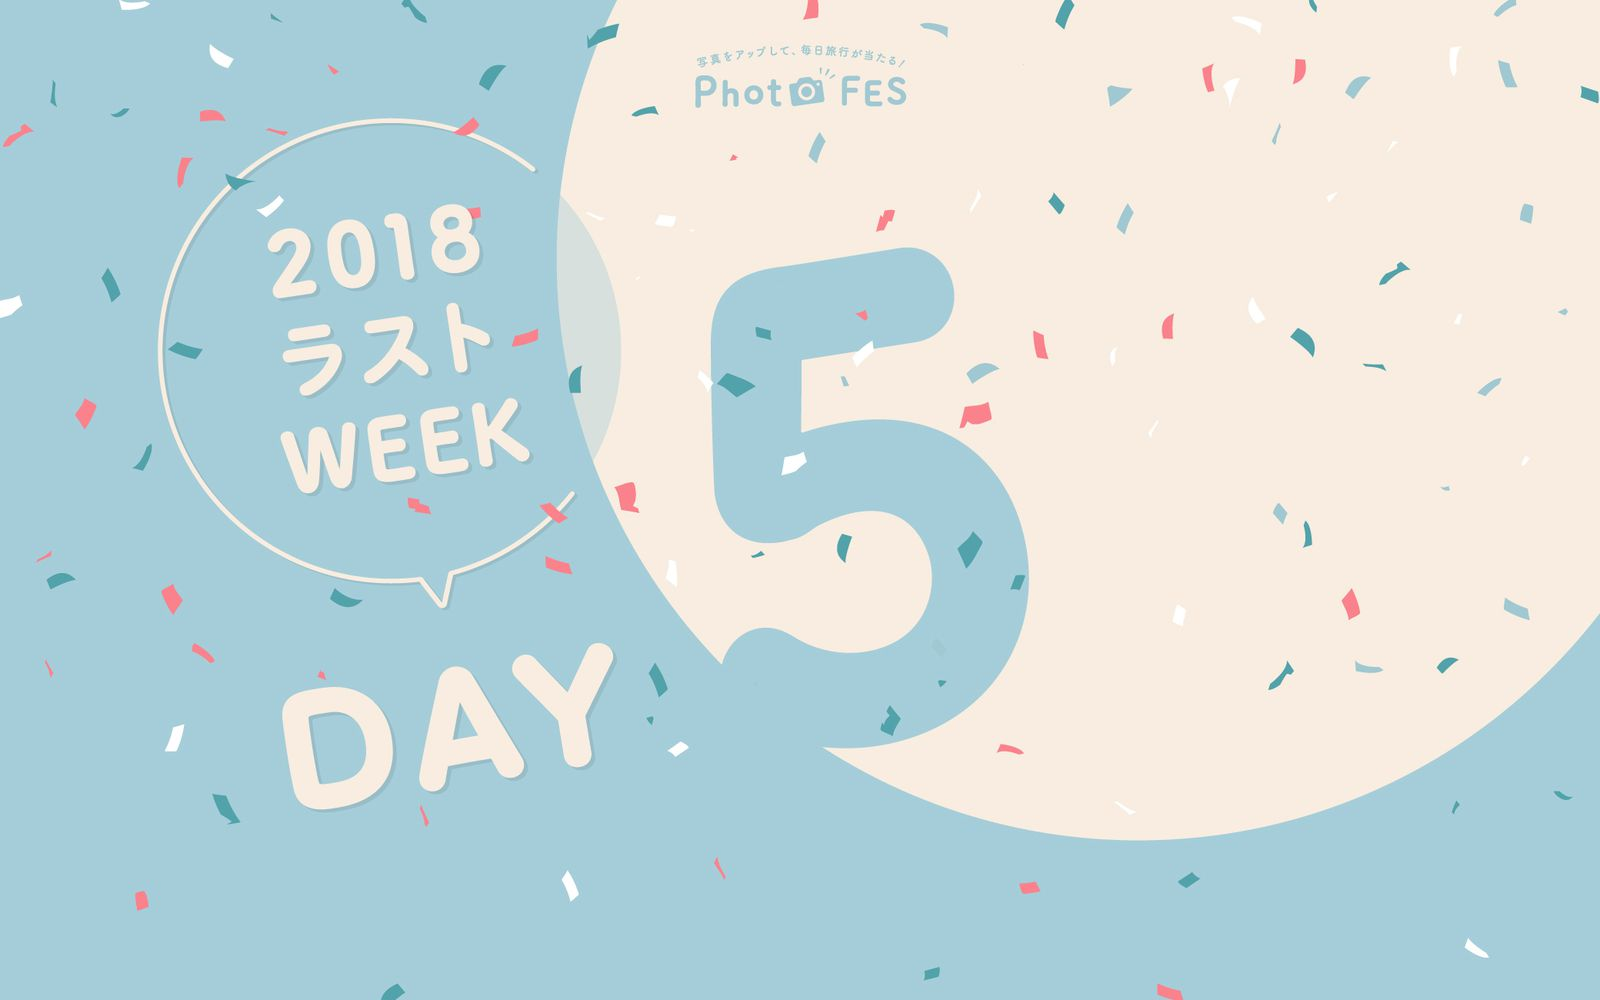 【DAY5】「Photo FES Winter 2019」12月30日投稿分であたる賞品&受賞者発表